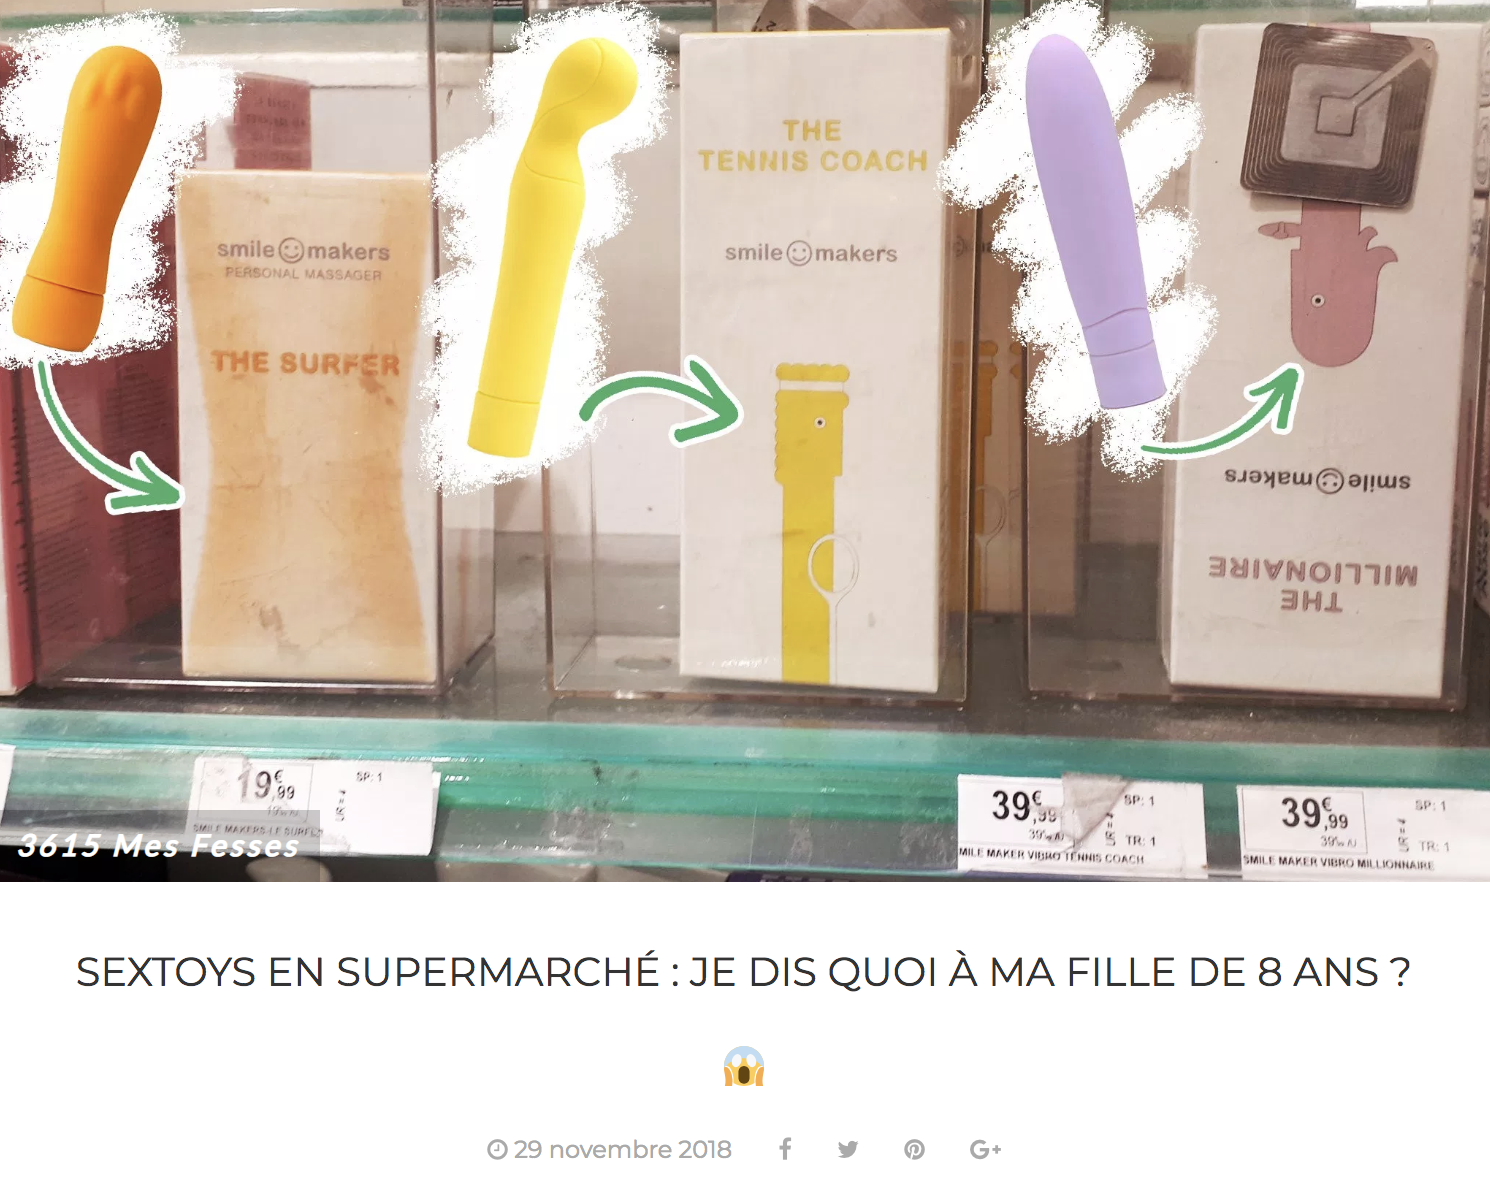 Sextoys en supermarch\u00e9 : je dis quoi \u00e0 ma fille de 8 ans ?